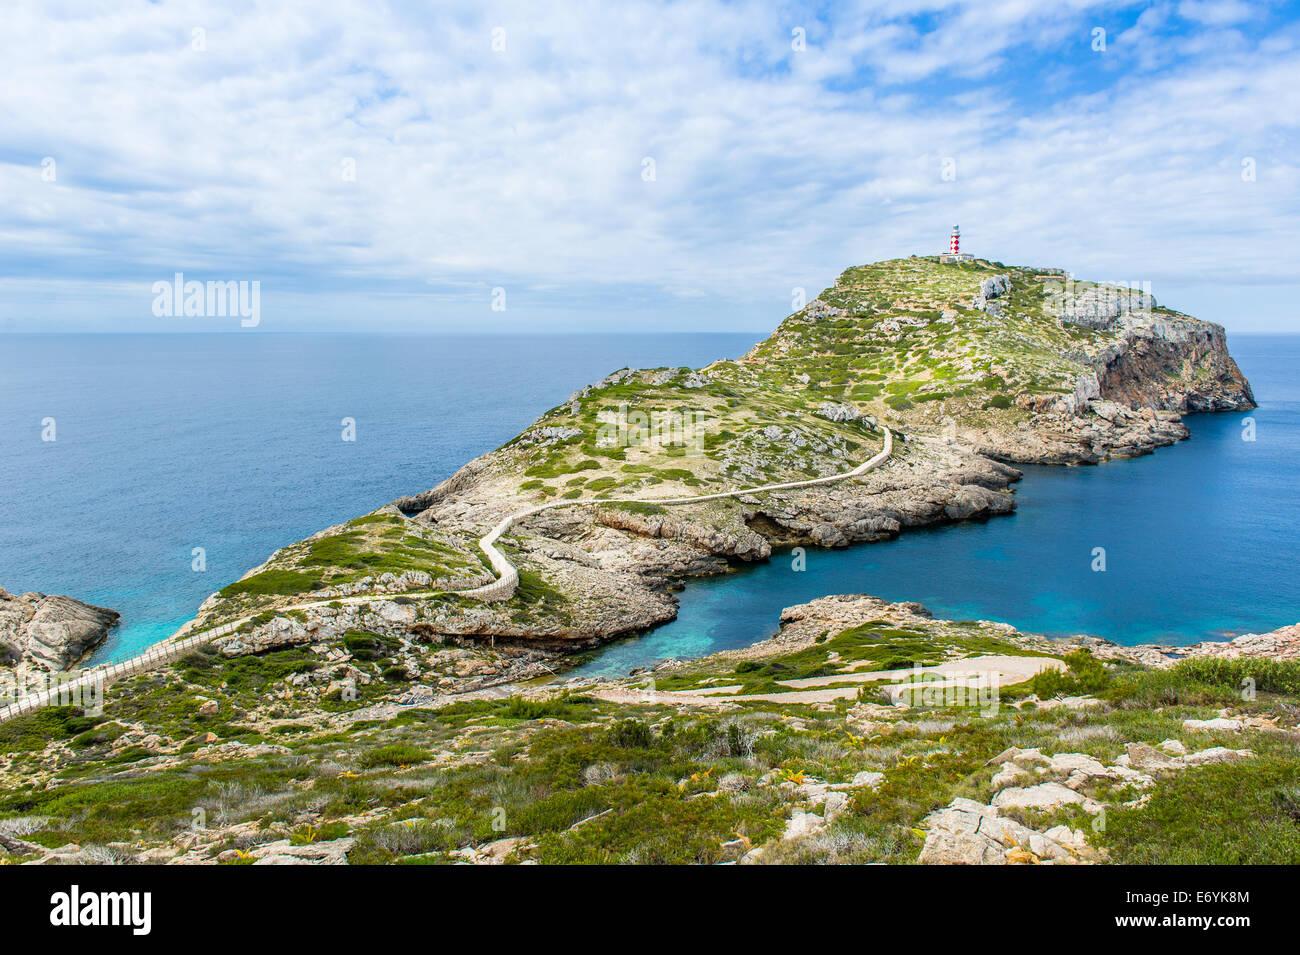 Lighthouse on Cabrera island. Balearic island, Spain - Stock Image